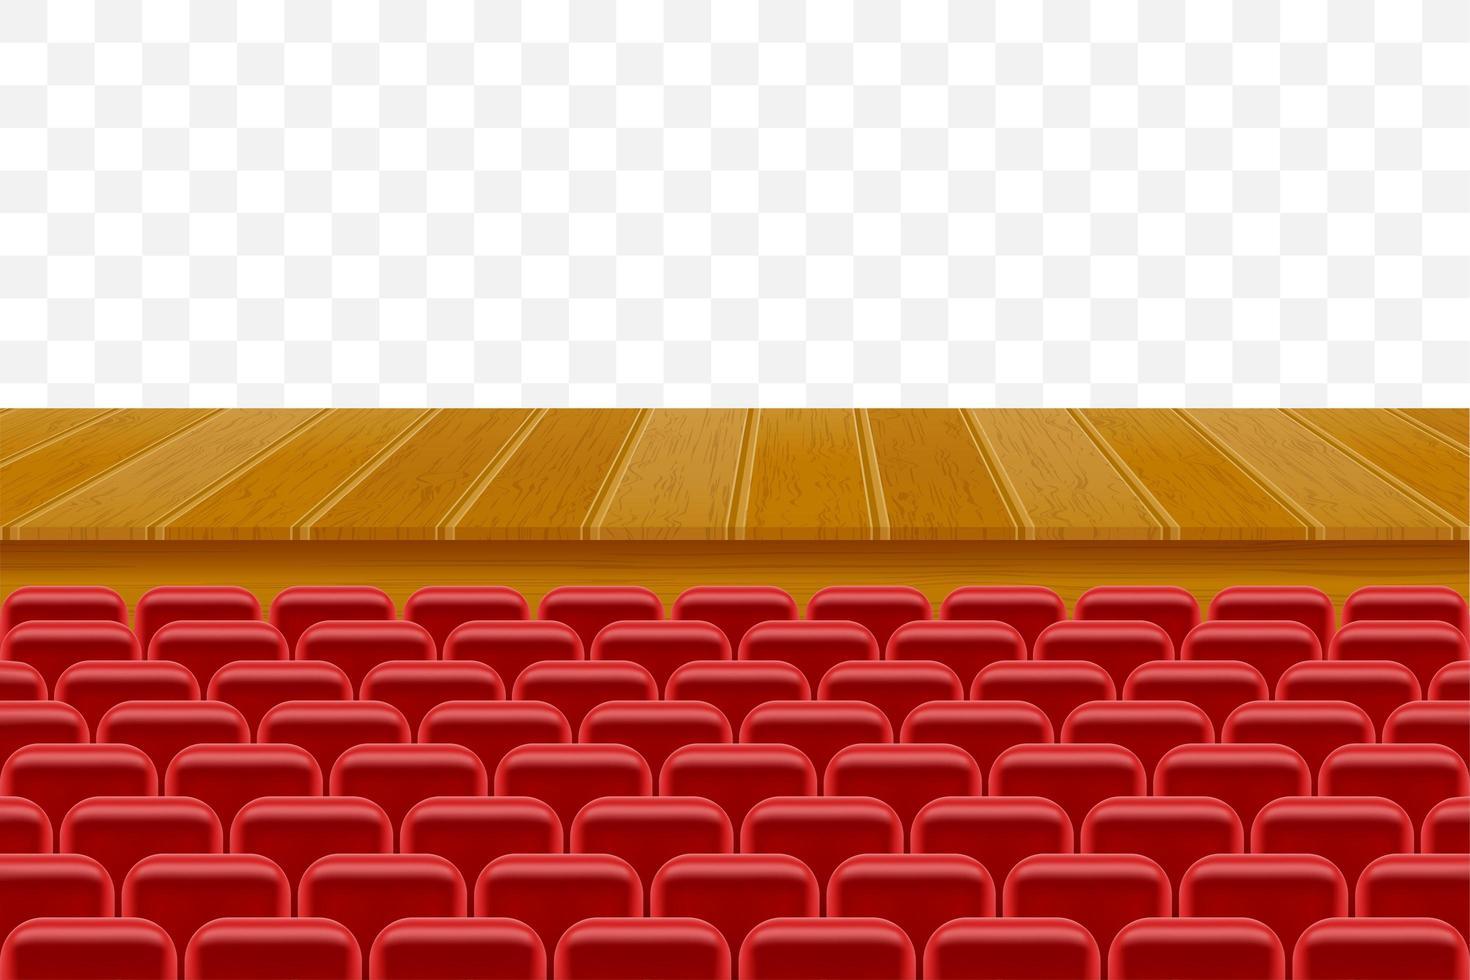 Escenario de teatro con asientos para espectadores. vector